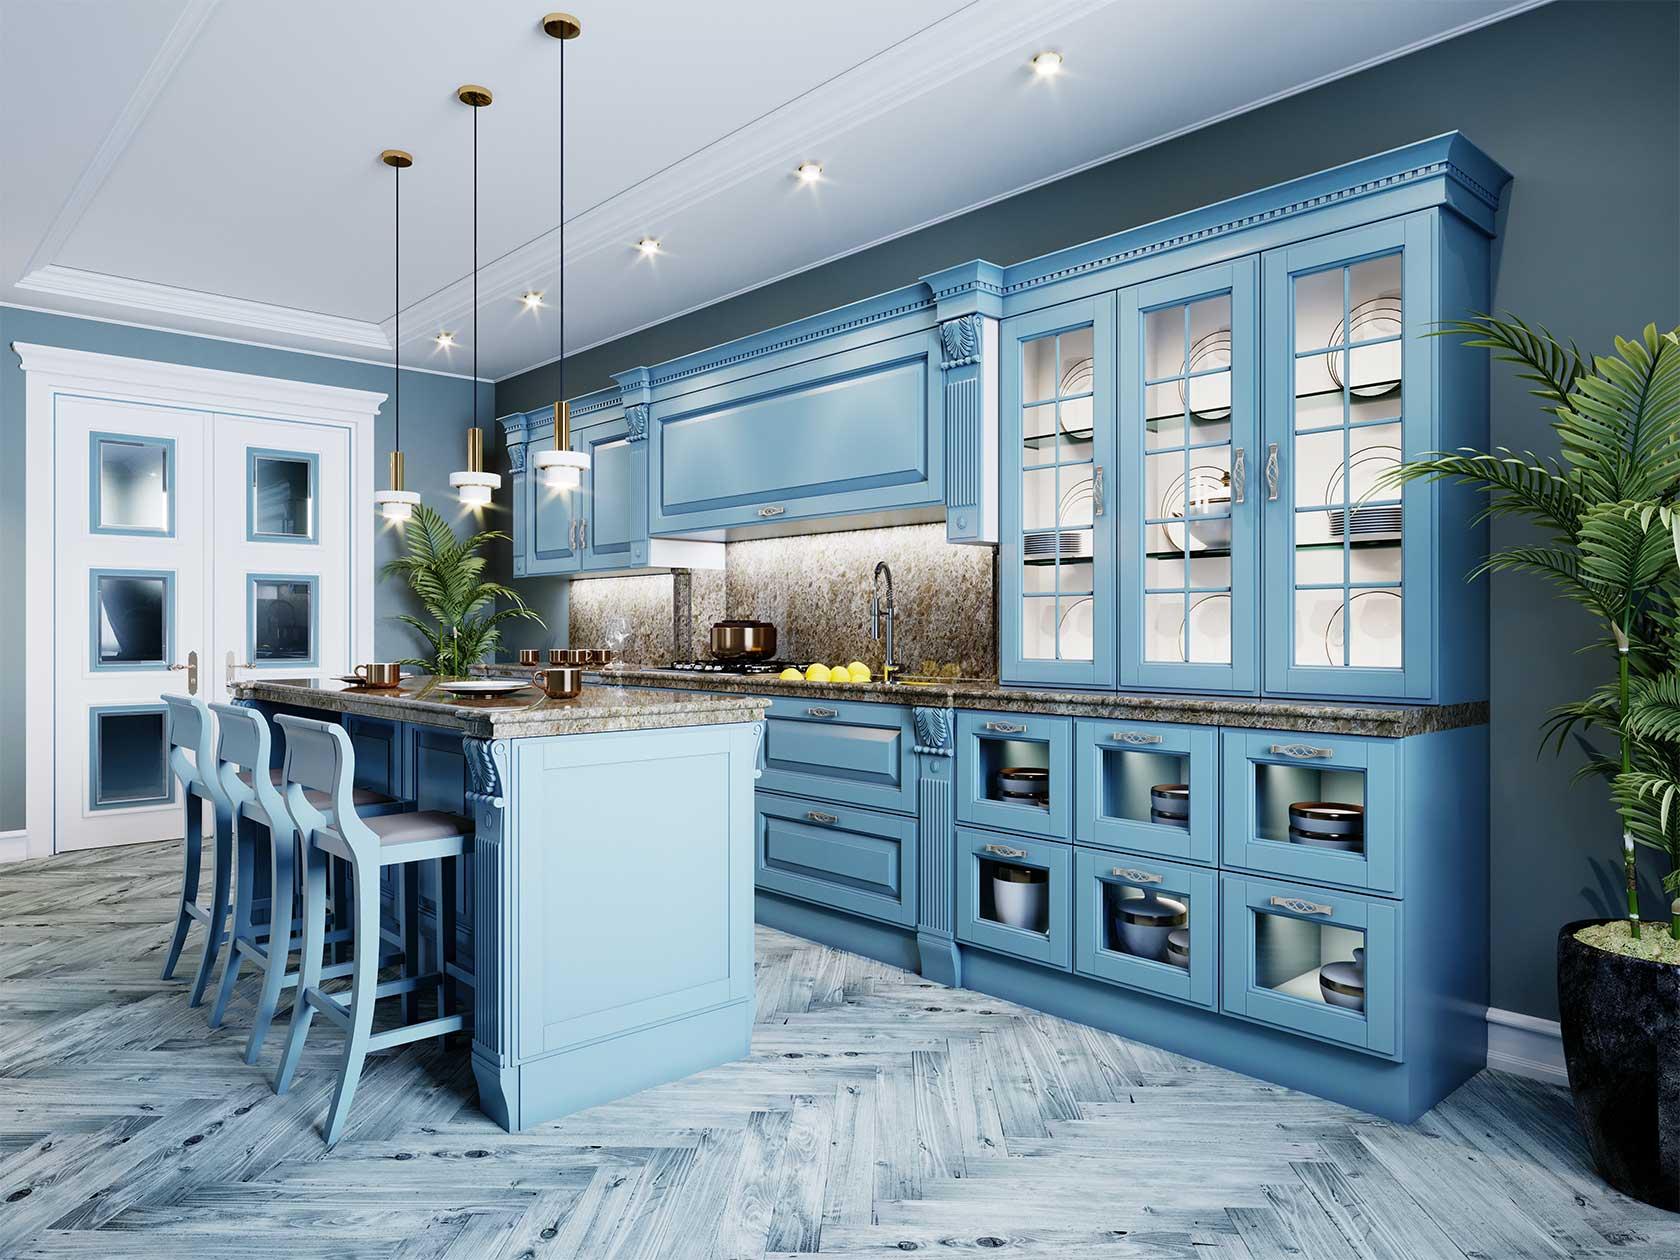 Chic Kitchen Cabinets